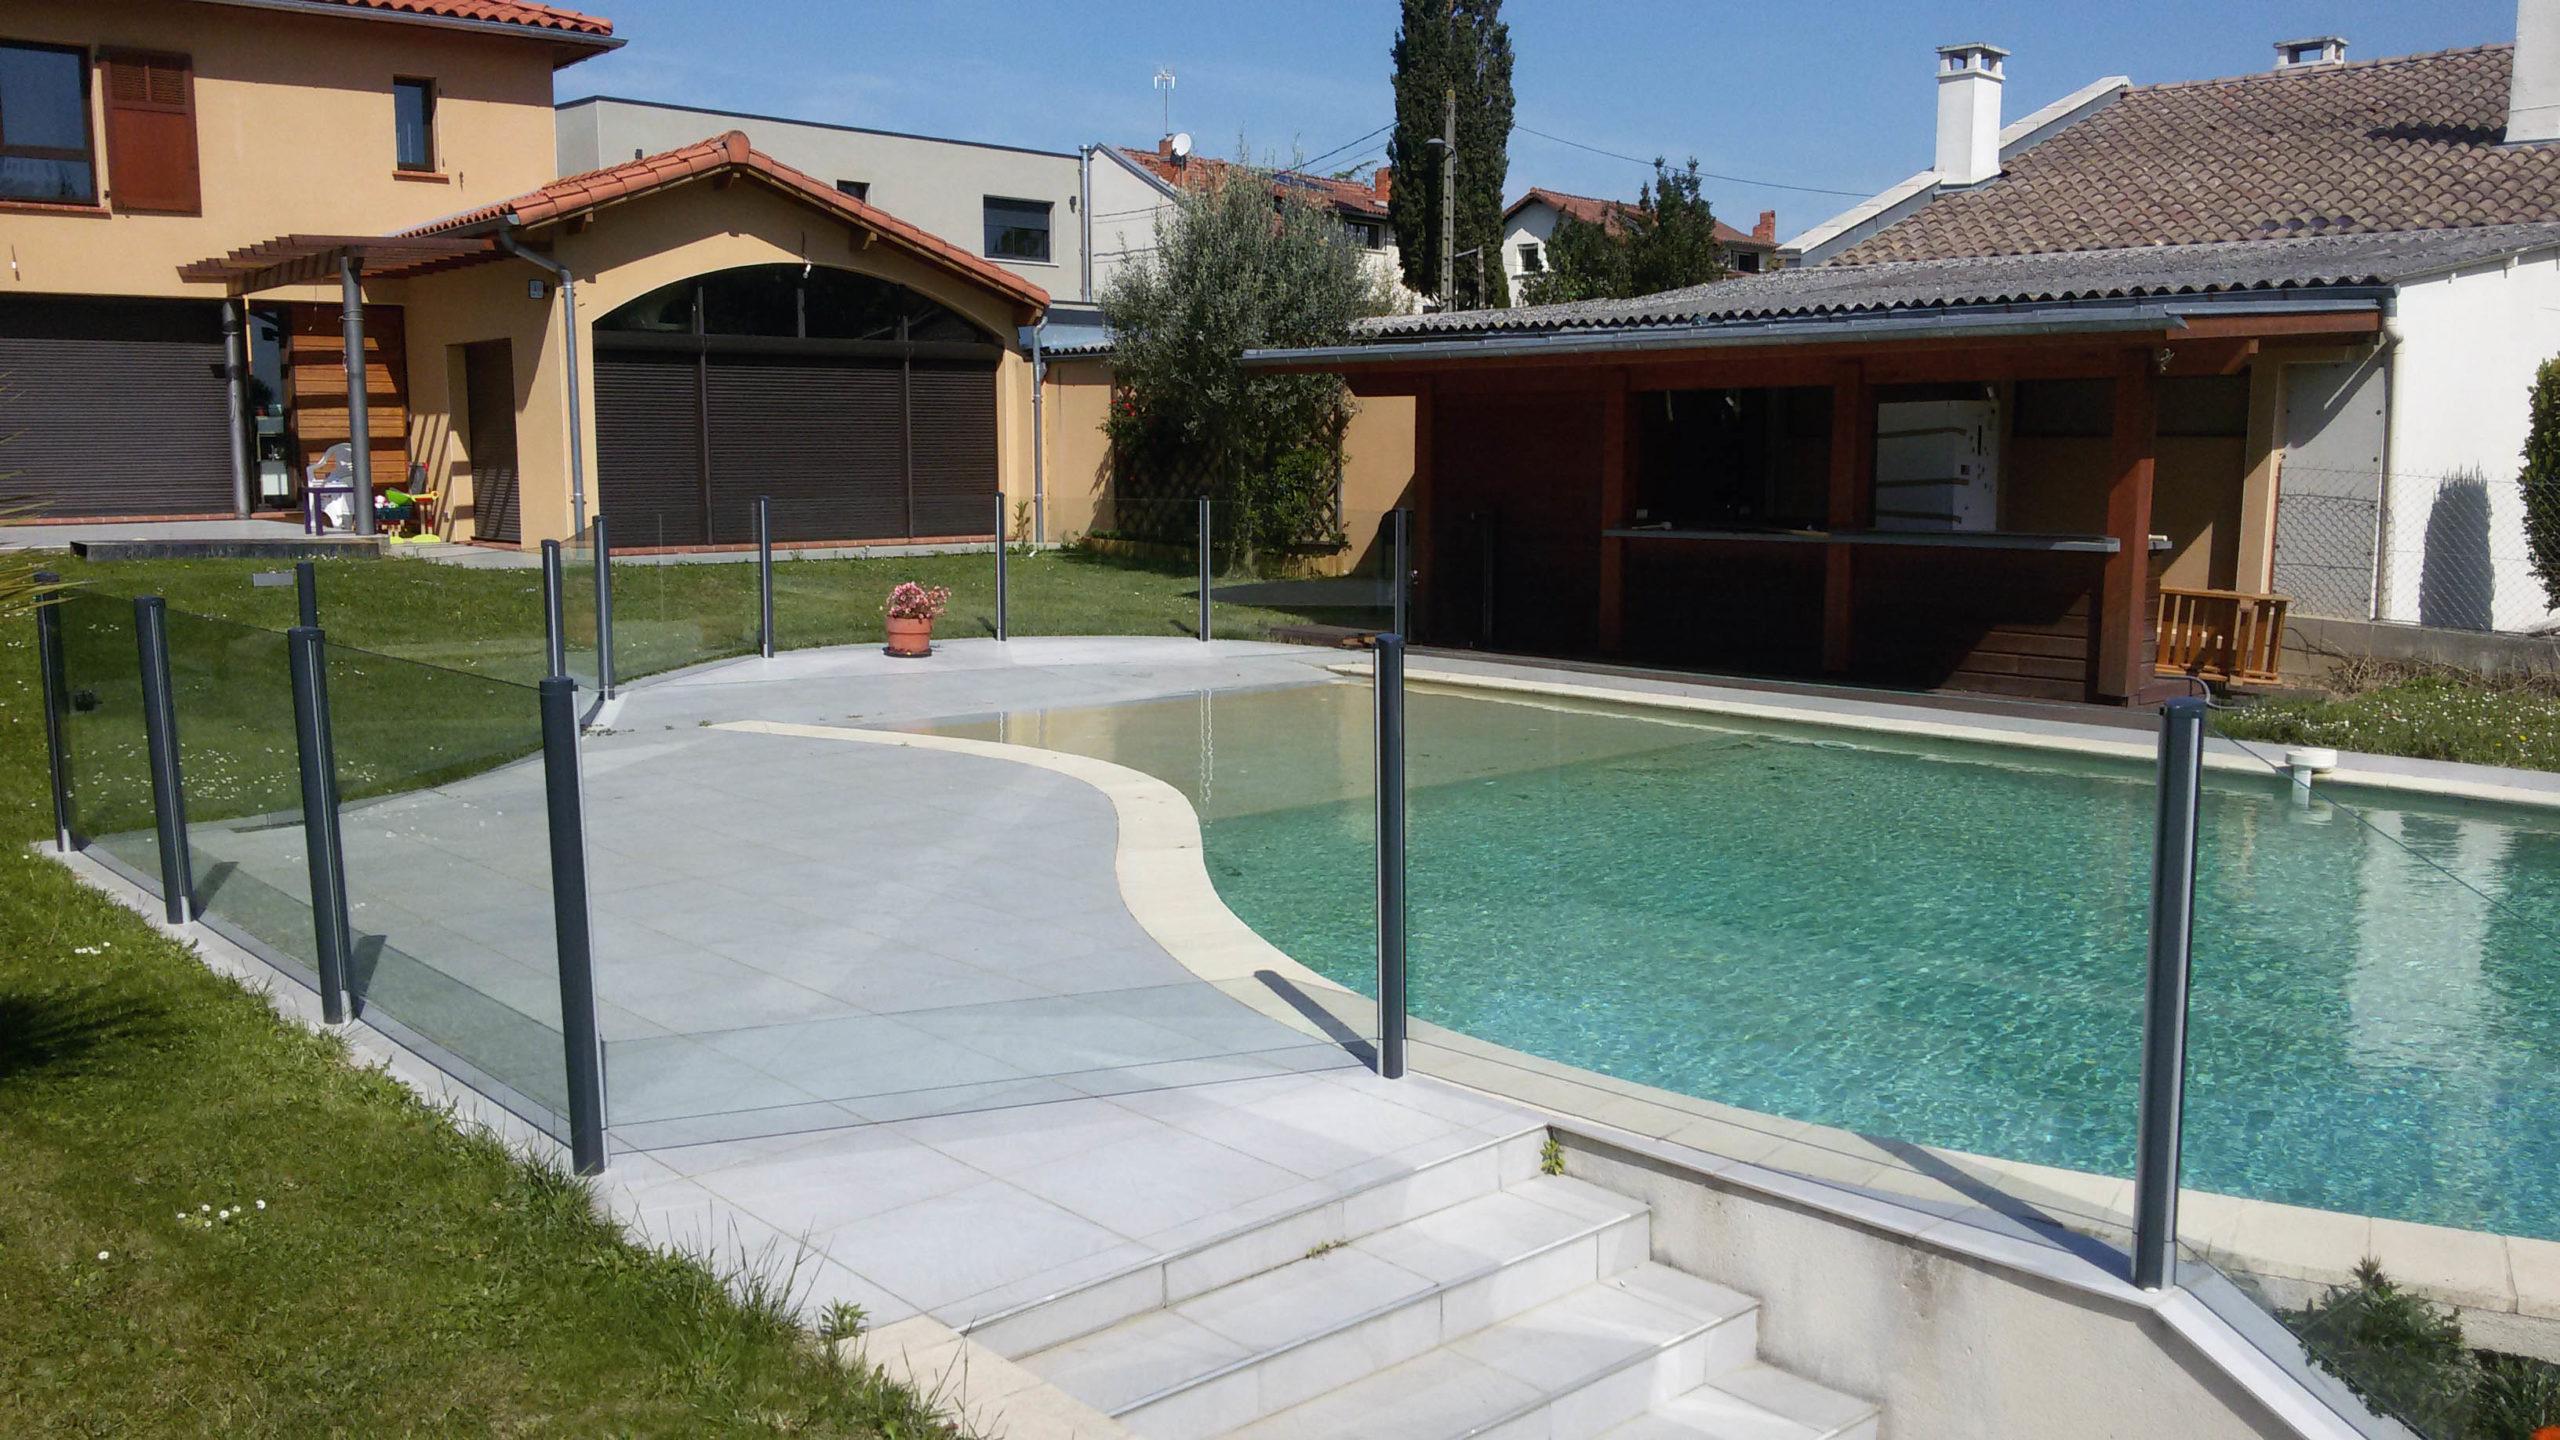 barriere piscine transparente verre agen  scaled